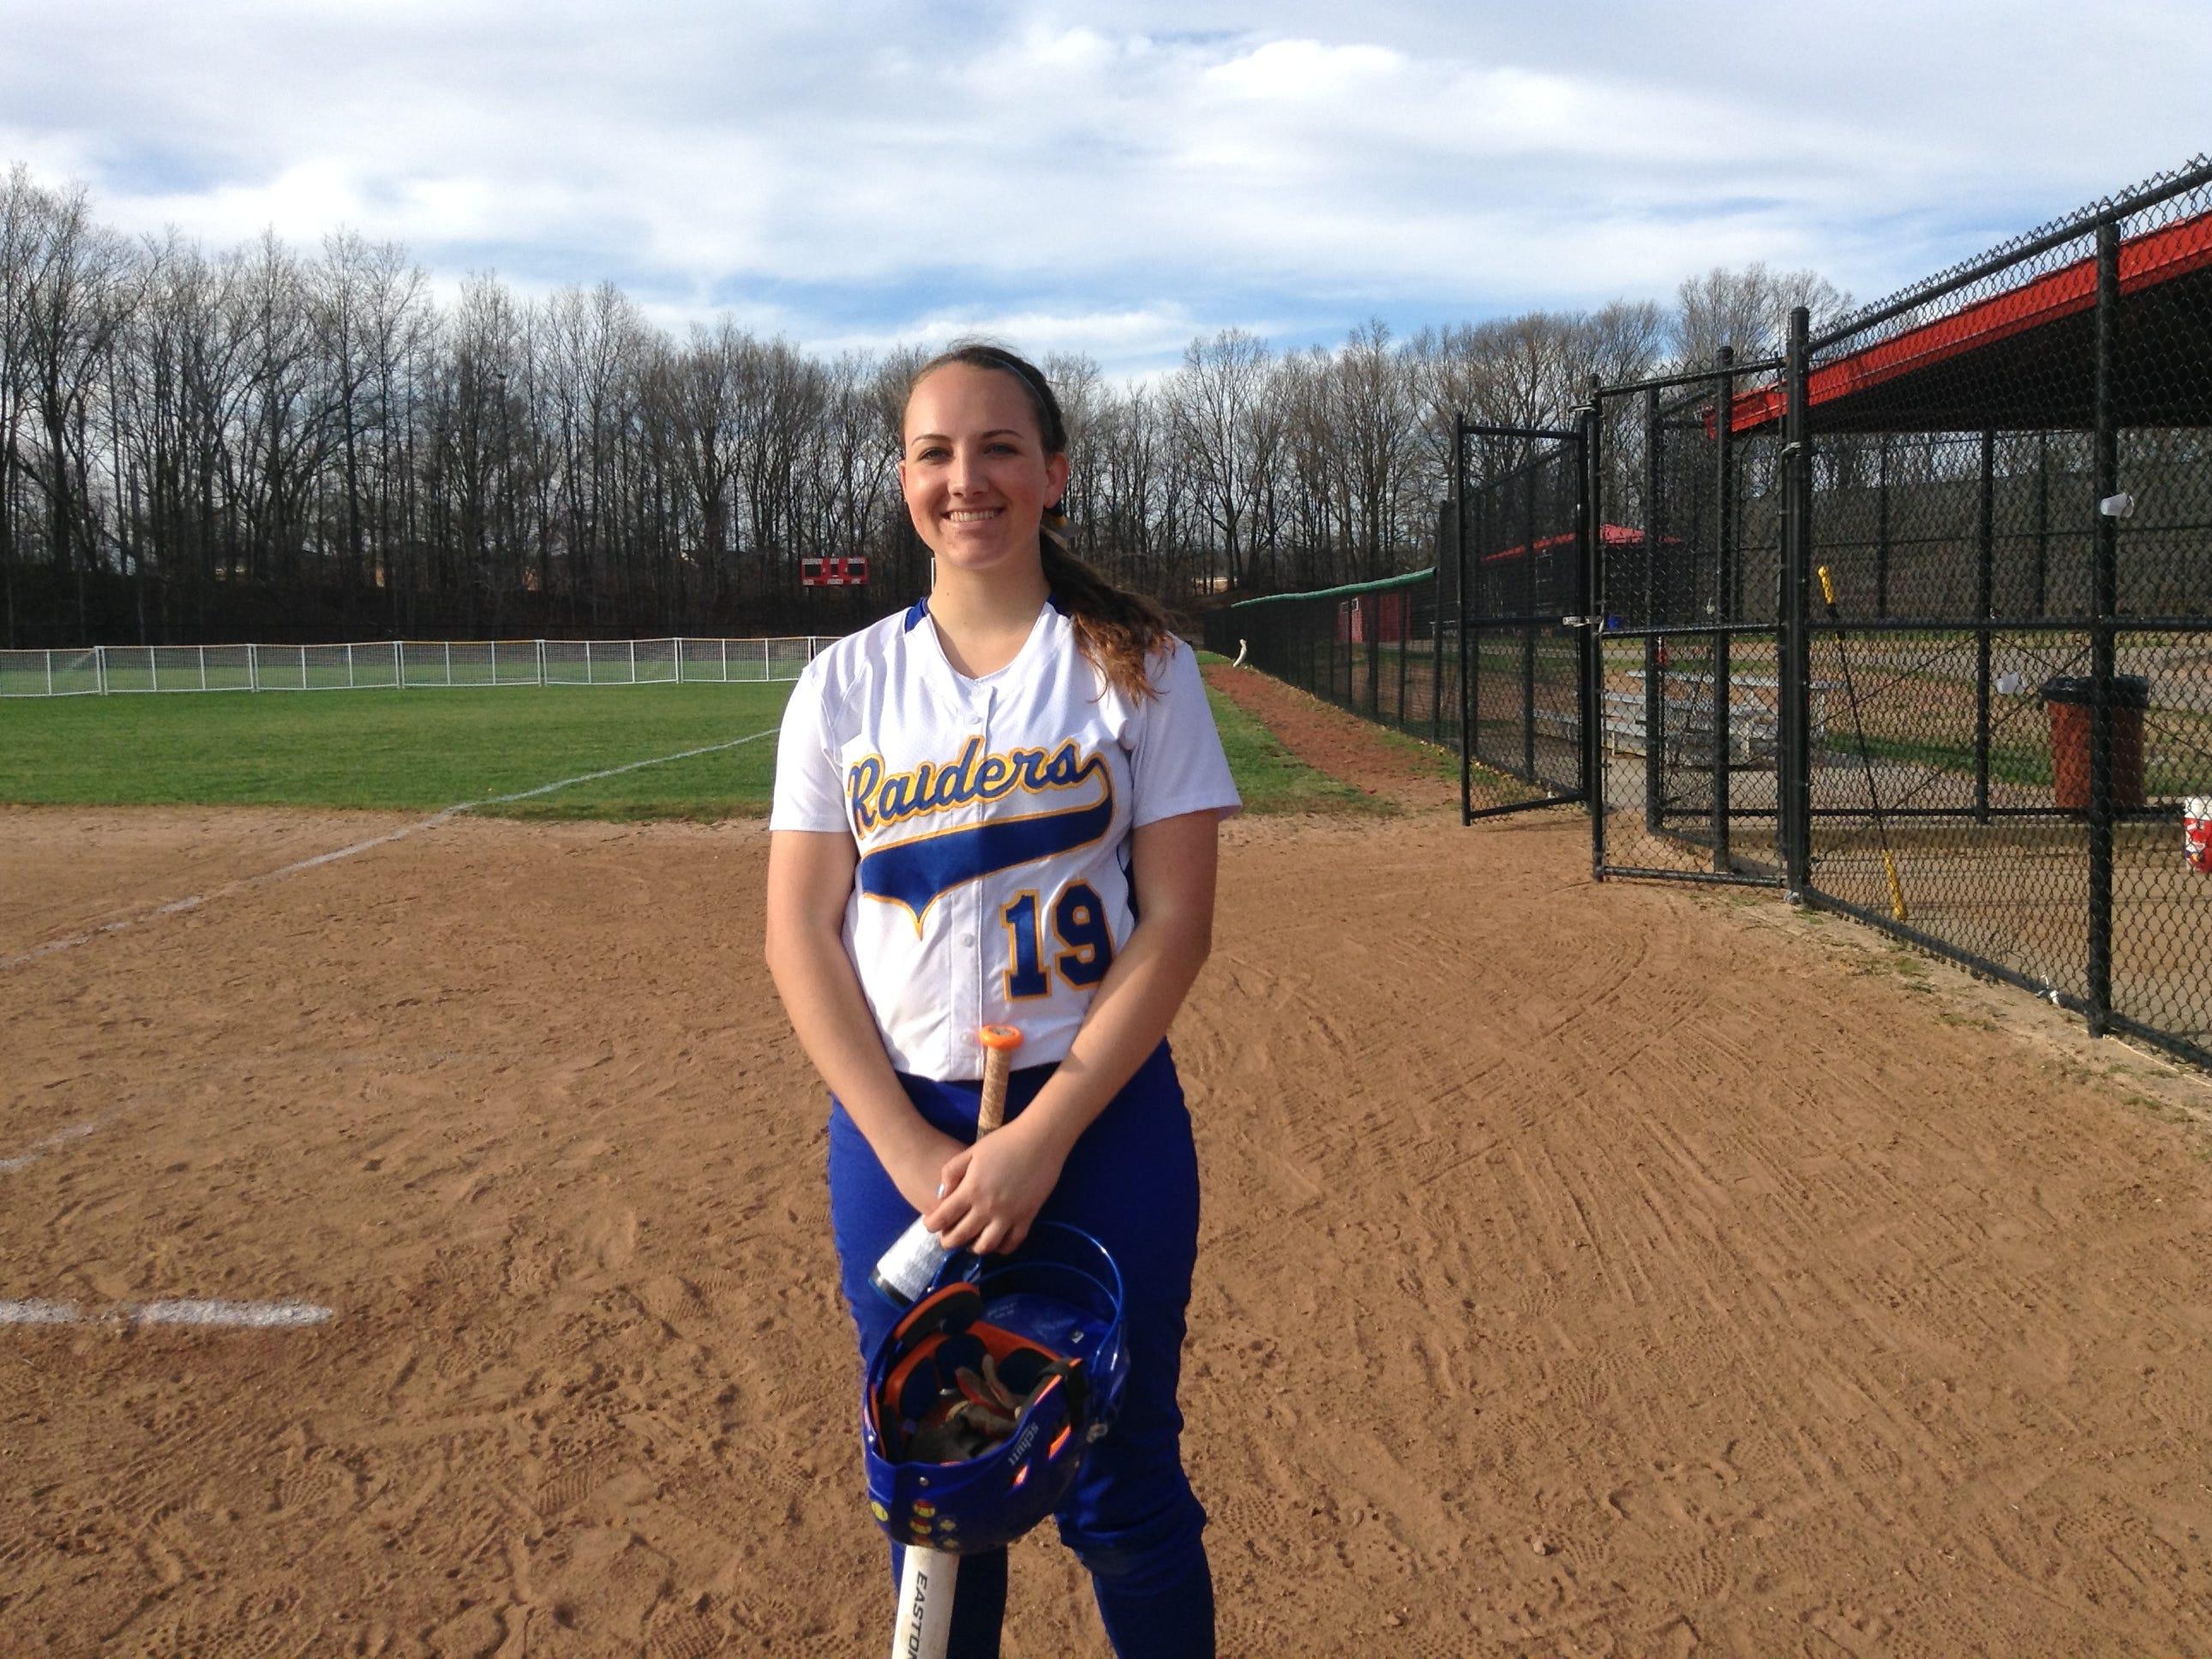 North Brunswick senior third baseman Rebecca Colandrea is this week's Home News Tribune Player of the Week